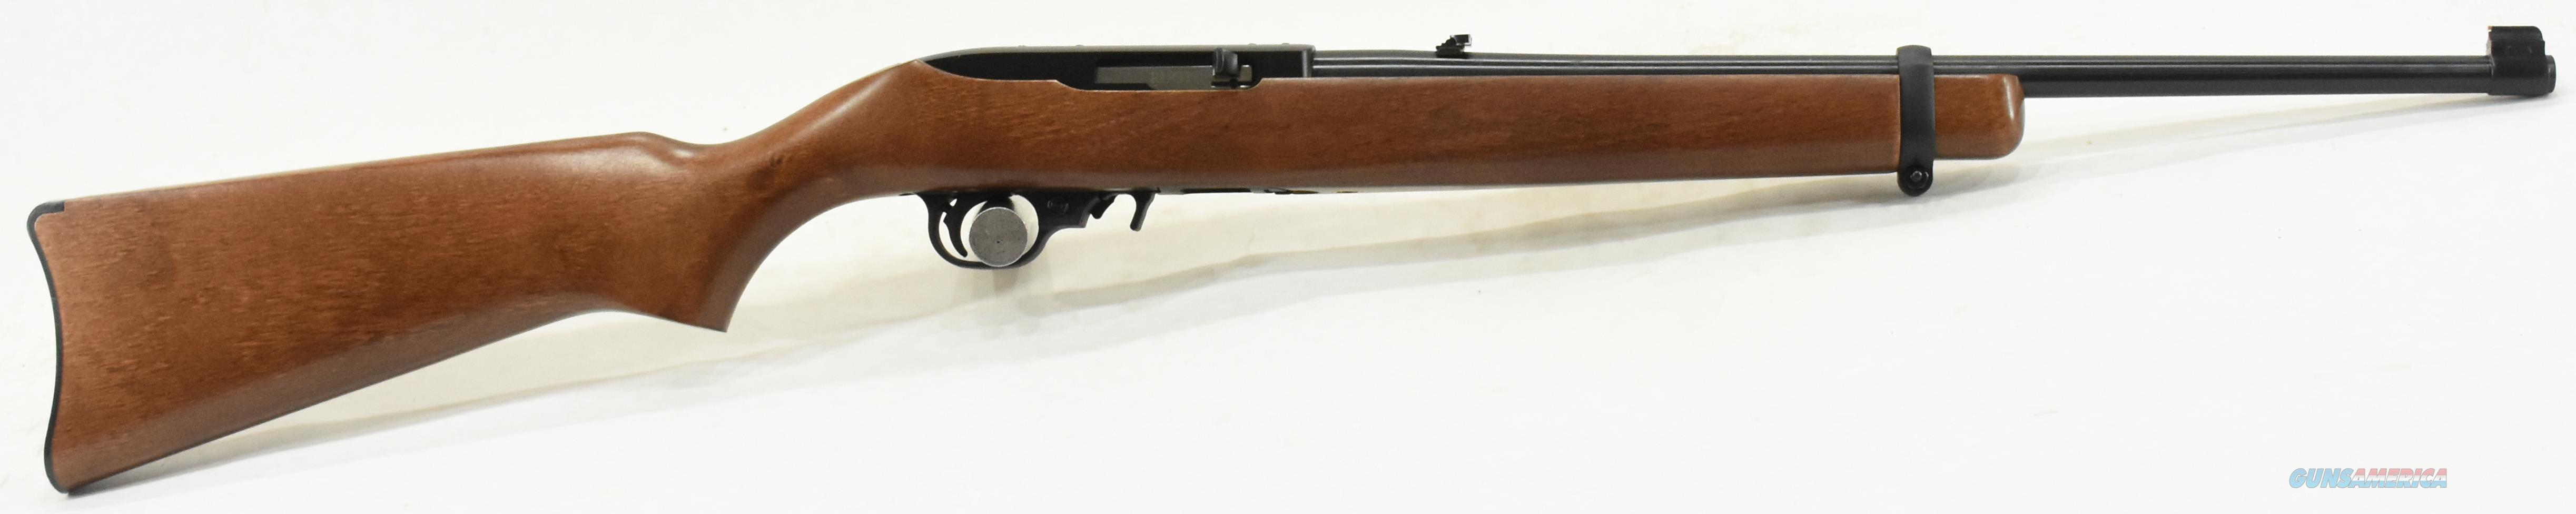 10/22 Carbine Wood 22LR 18.5In  1103  Guns > Rifles > Ruger Rifles > 10-22